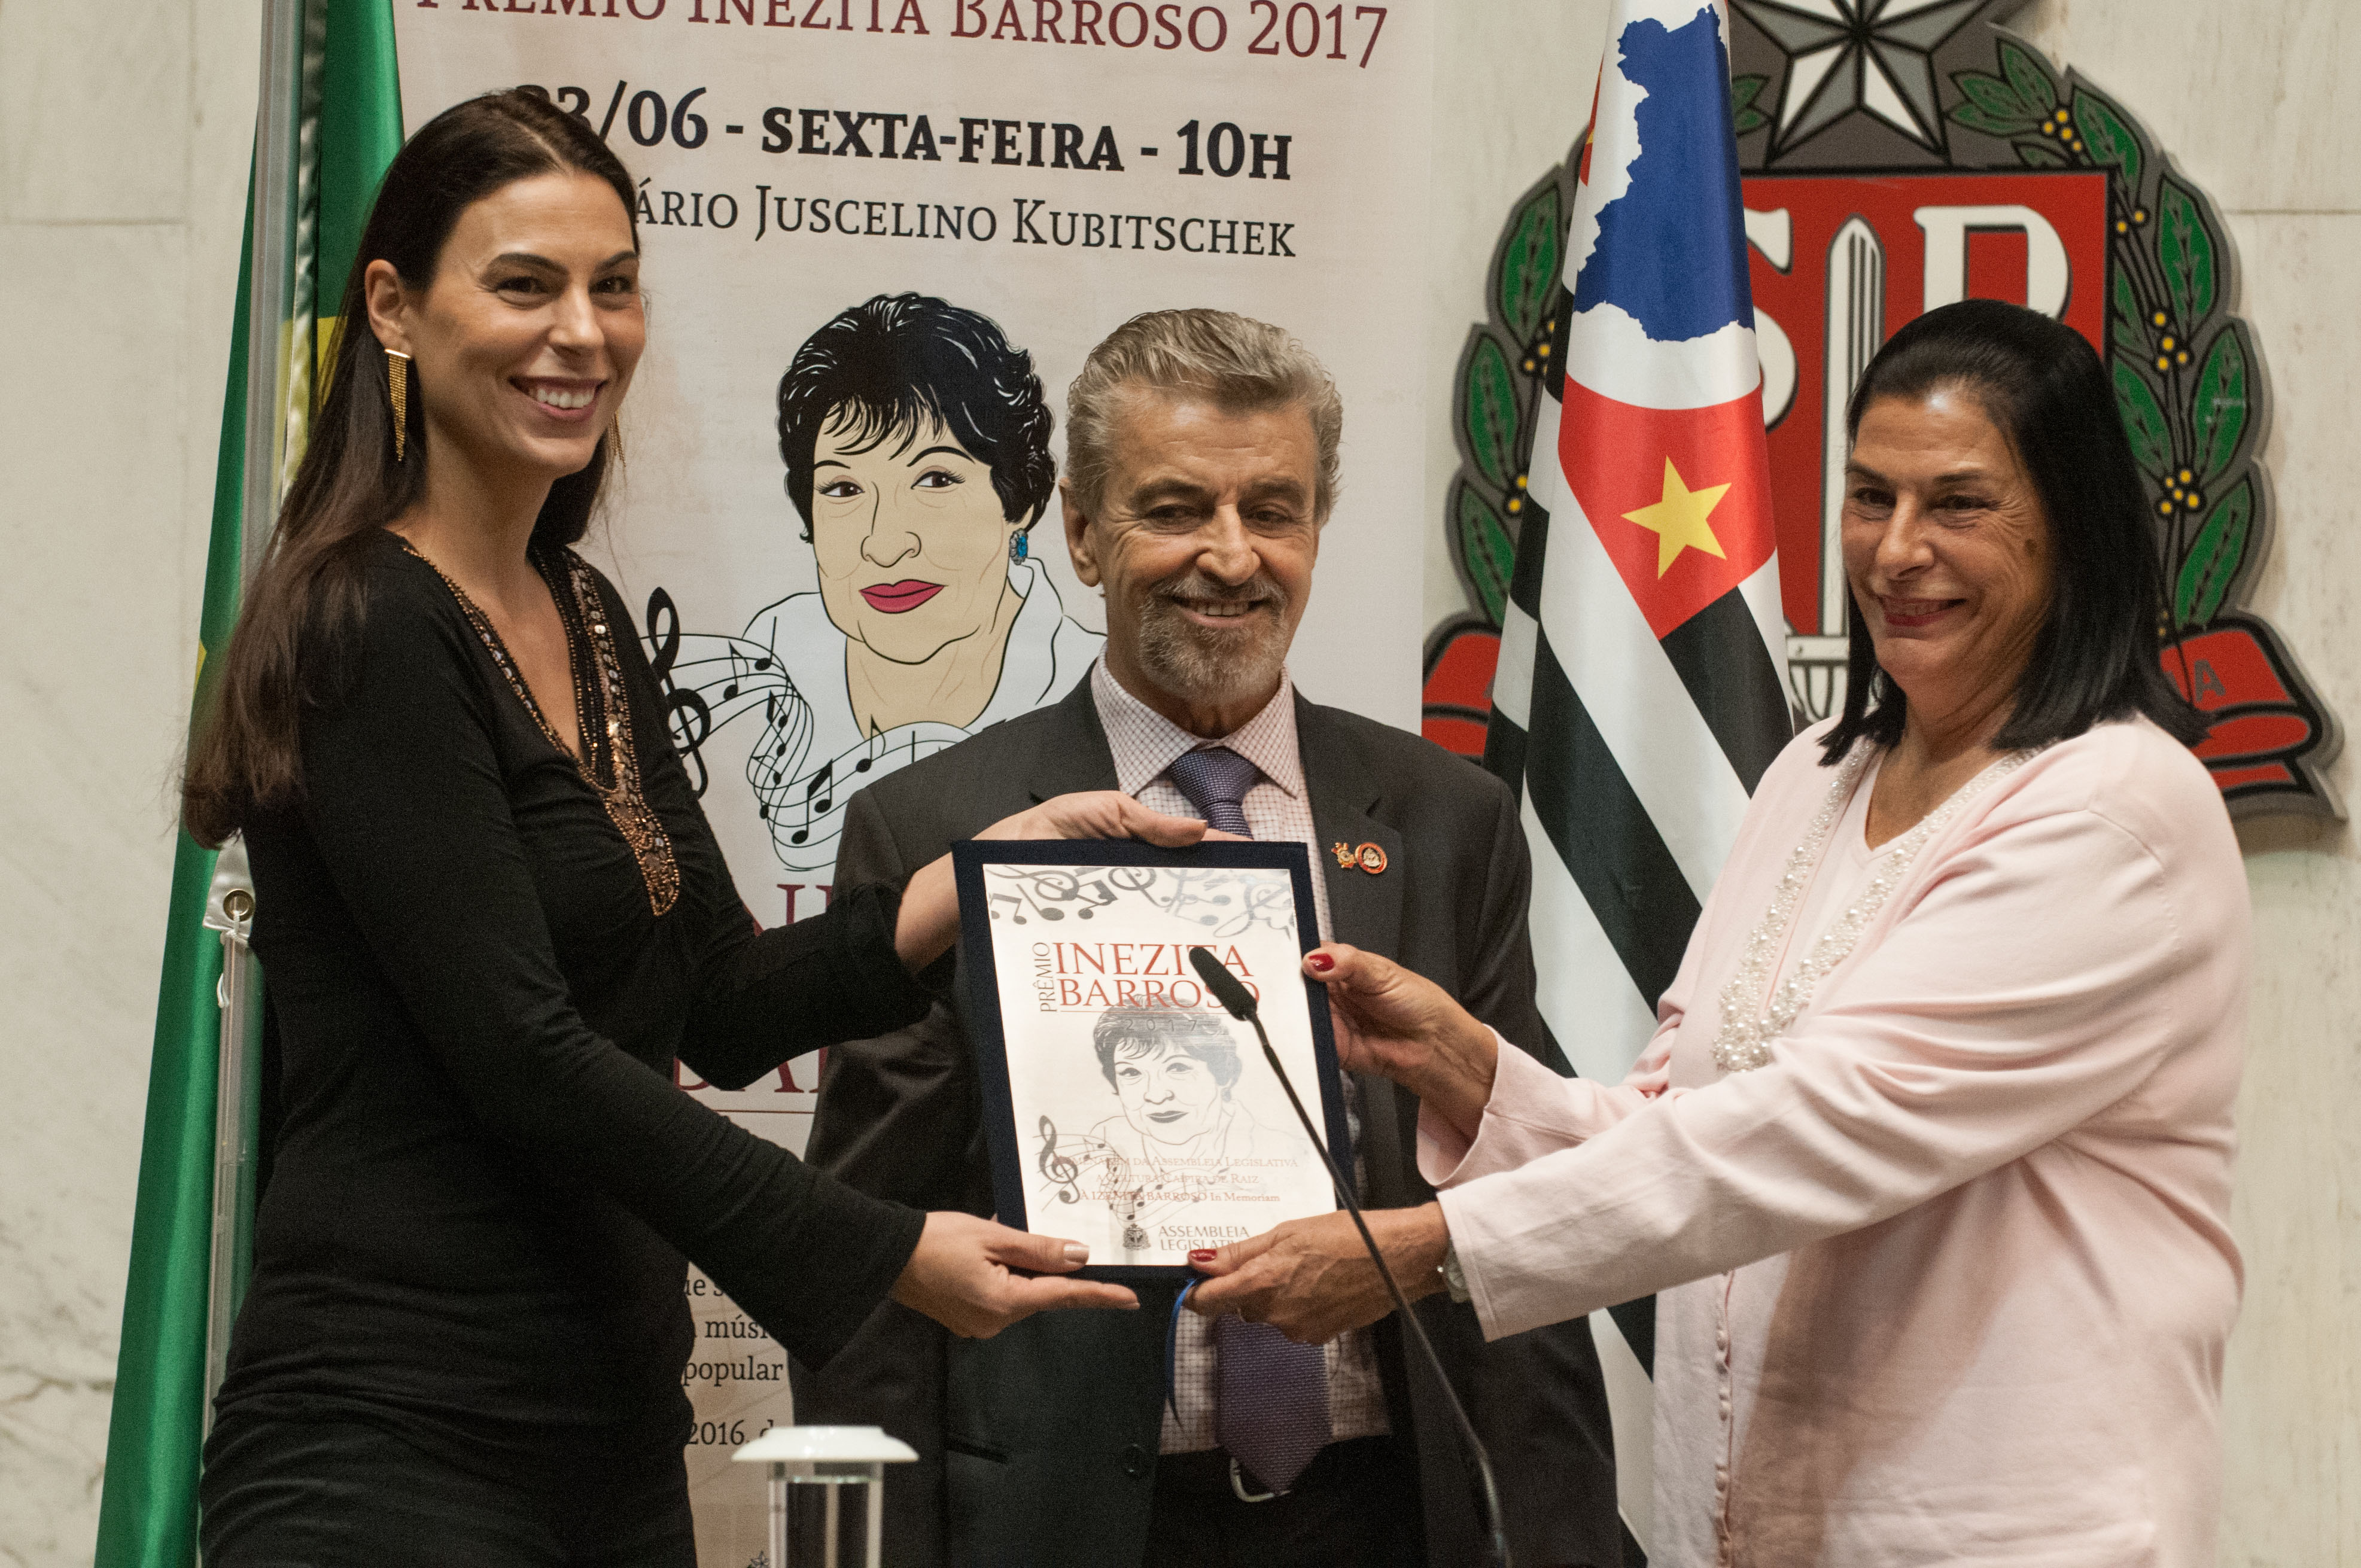 Paula Maia, Marcos Martins e Marta Barroso<a style='float:right' href='https://www3.al.sp.gov.br/repositorio/noticia/N-06-2017/fg204223.jpg' target=_blank><img src='/_img/material-file-download-white.png' width='14px' alt='Clique para baixar a imagem'></a>